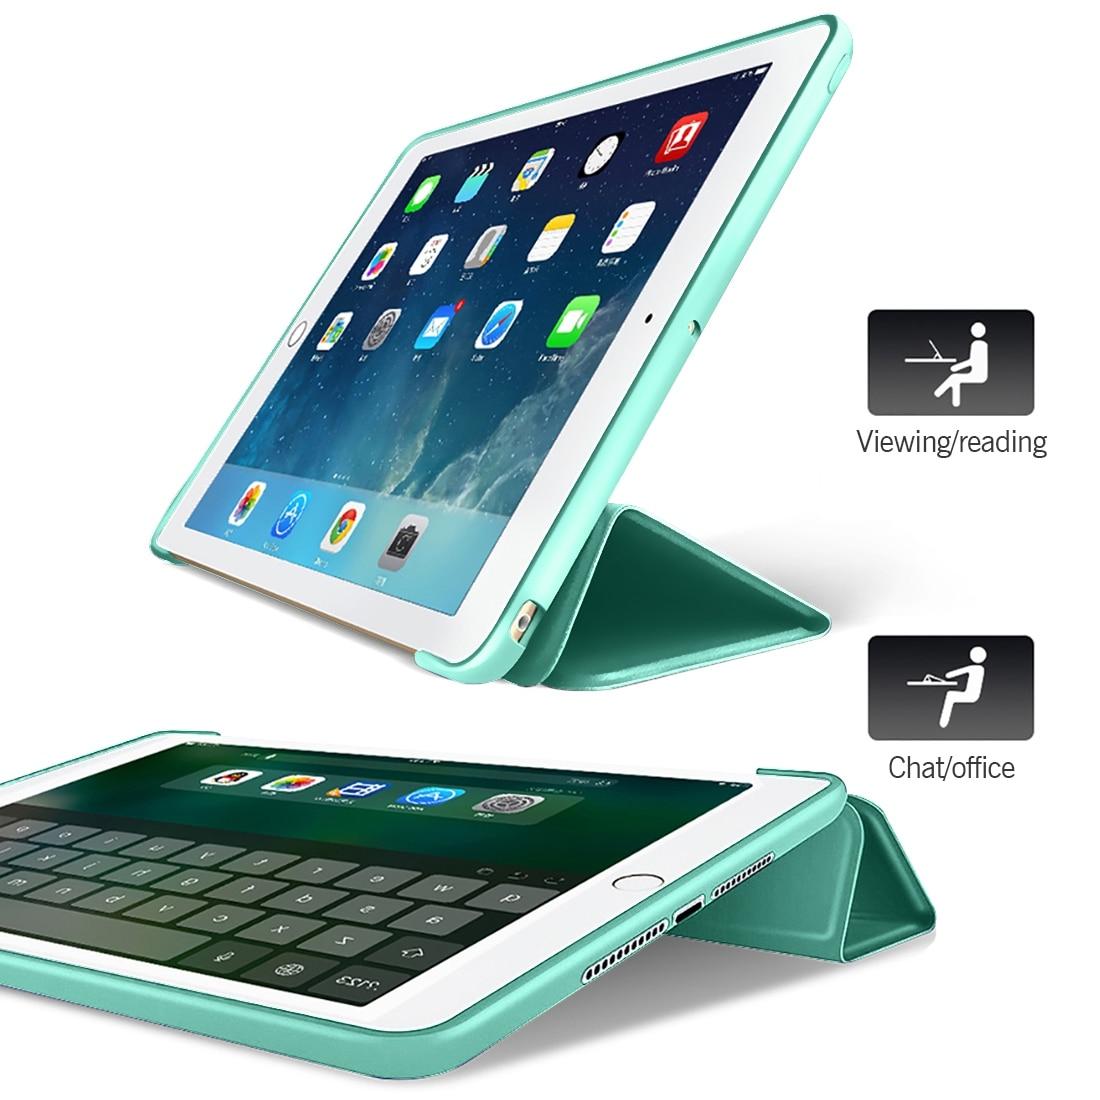 Hoesje voor iPad Mini 4 3 2 1 Case PU-leder Silicon Soft Back Trifold - Tablet accessoires - Foto 5